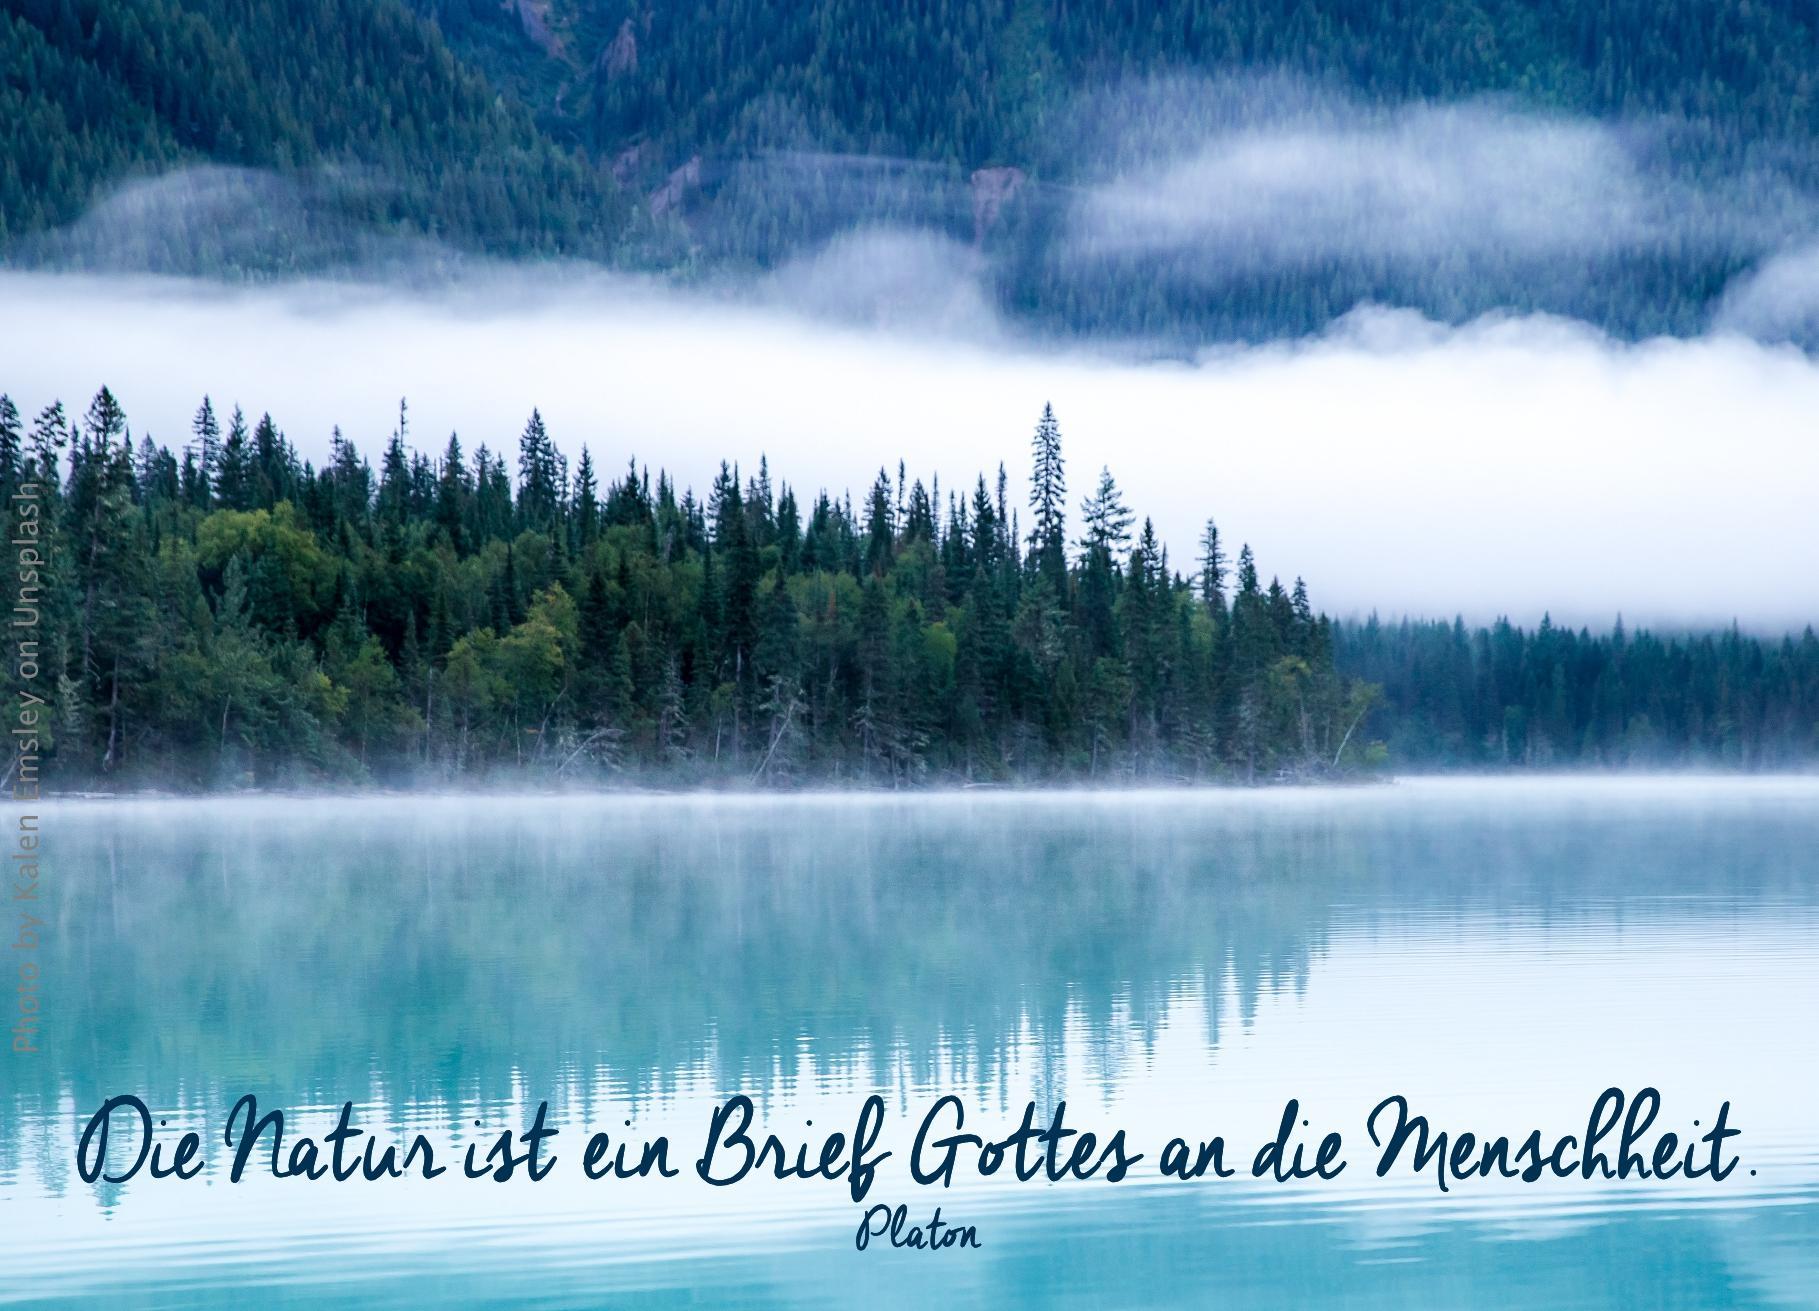 See vor bewaldeten Bergen im Nebel